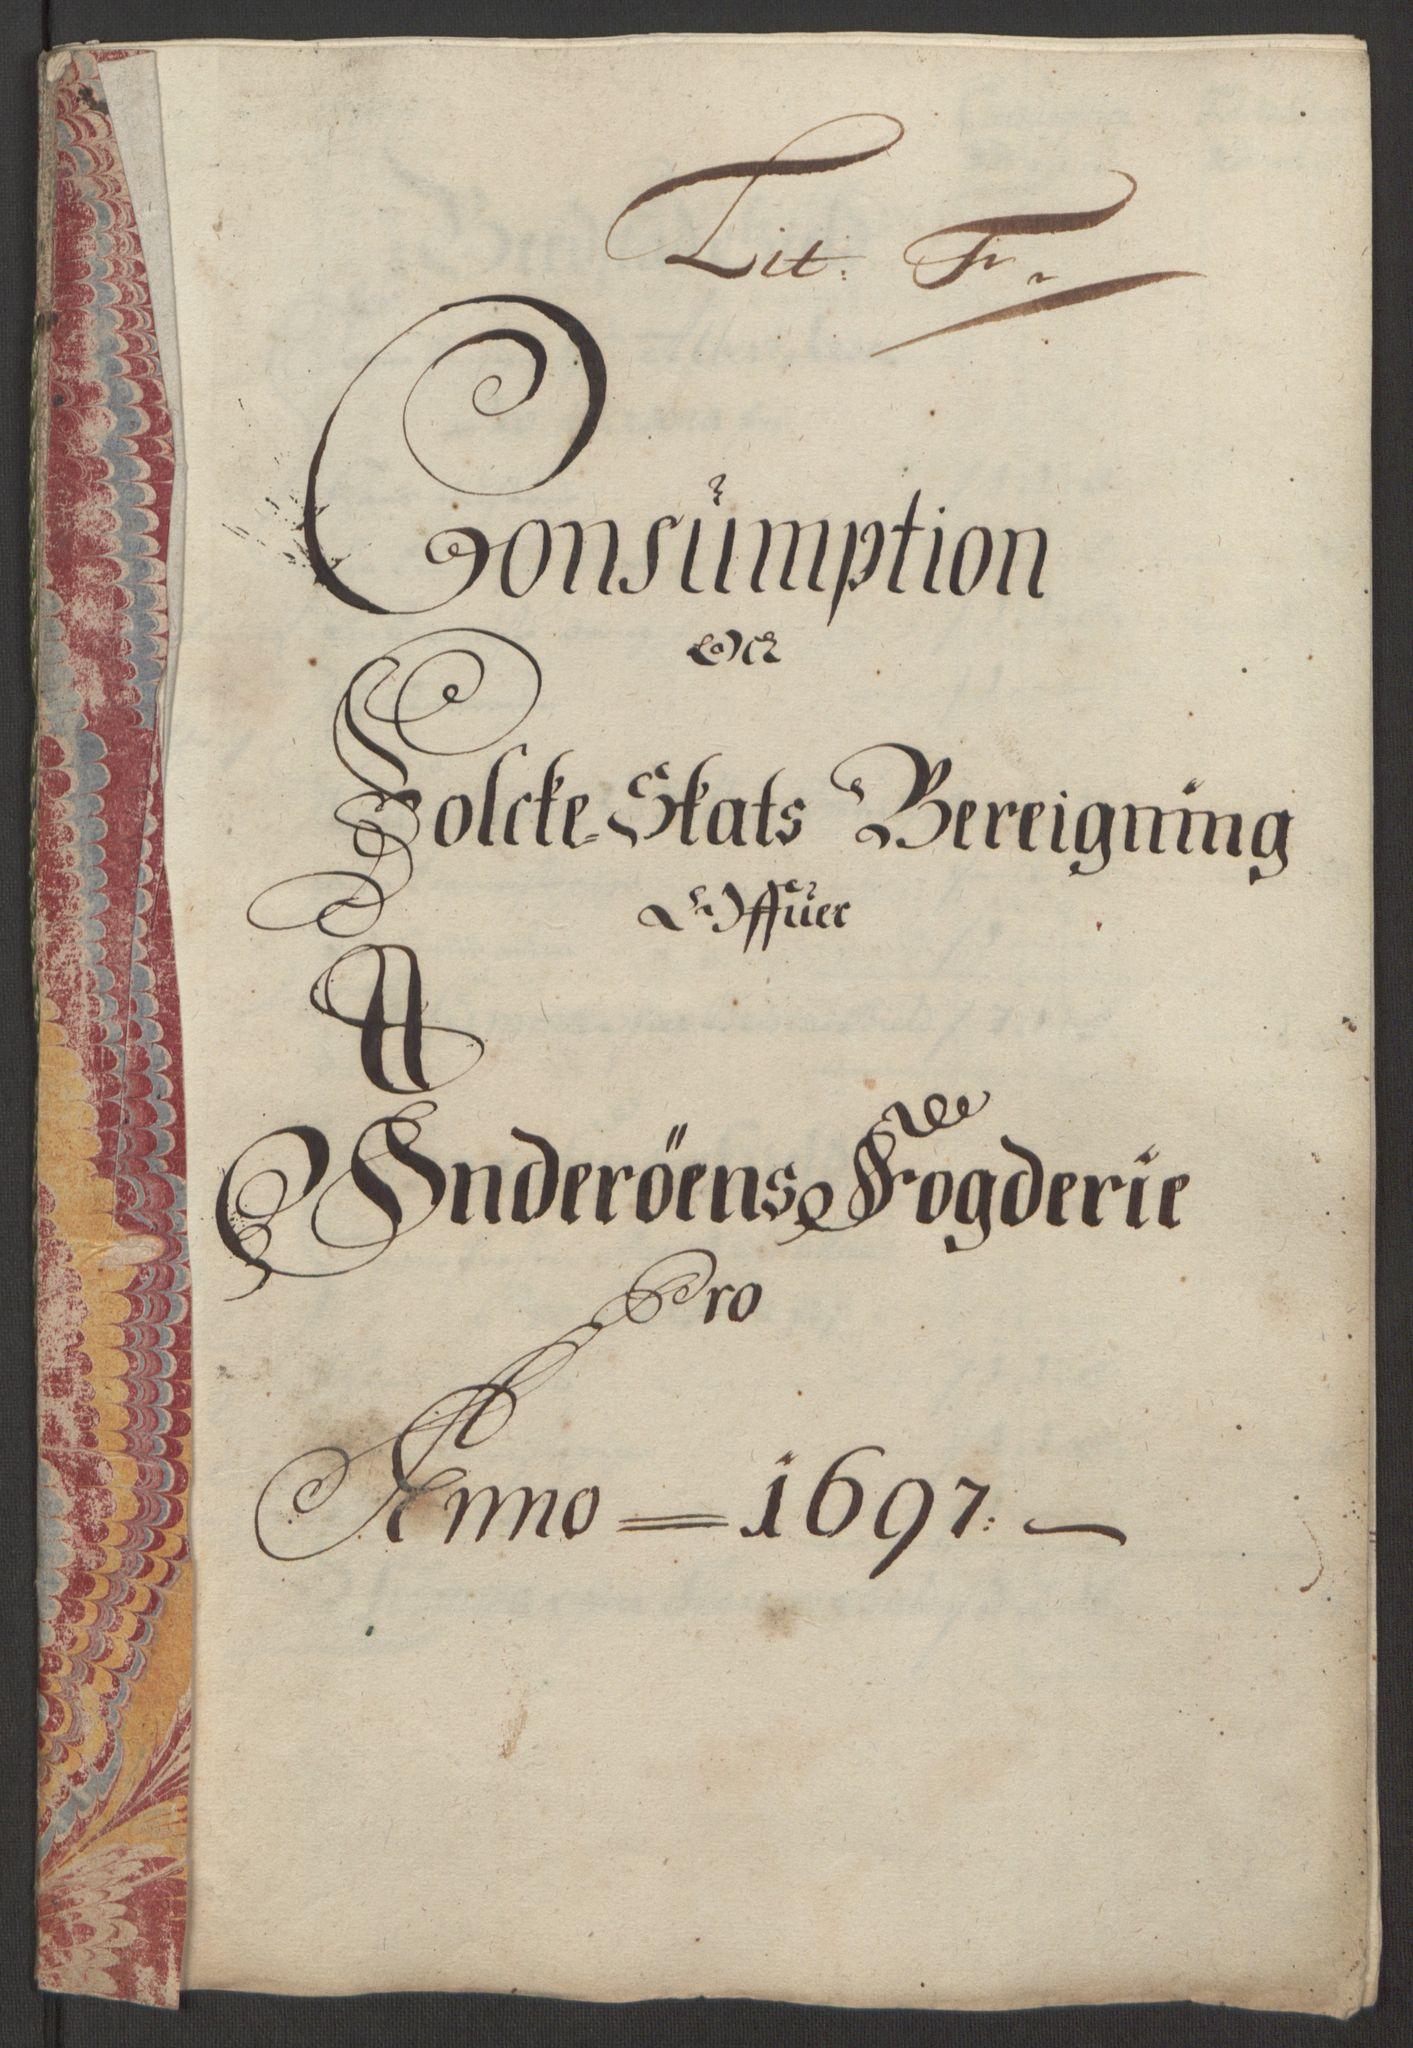 RA, Rentekammeret inntil 1814, Reviderte regnskaper, Fogderegnskap, R63/L4309: Fogderegnskap Inderøy, 1695-1697, s. 434